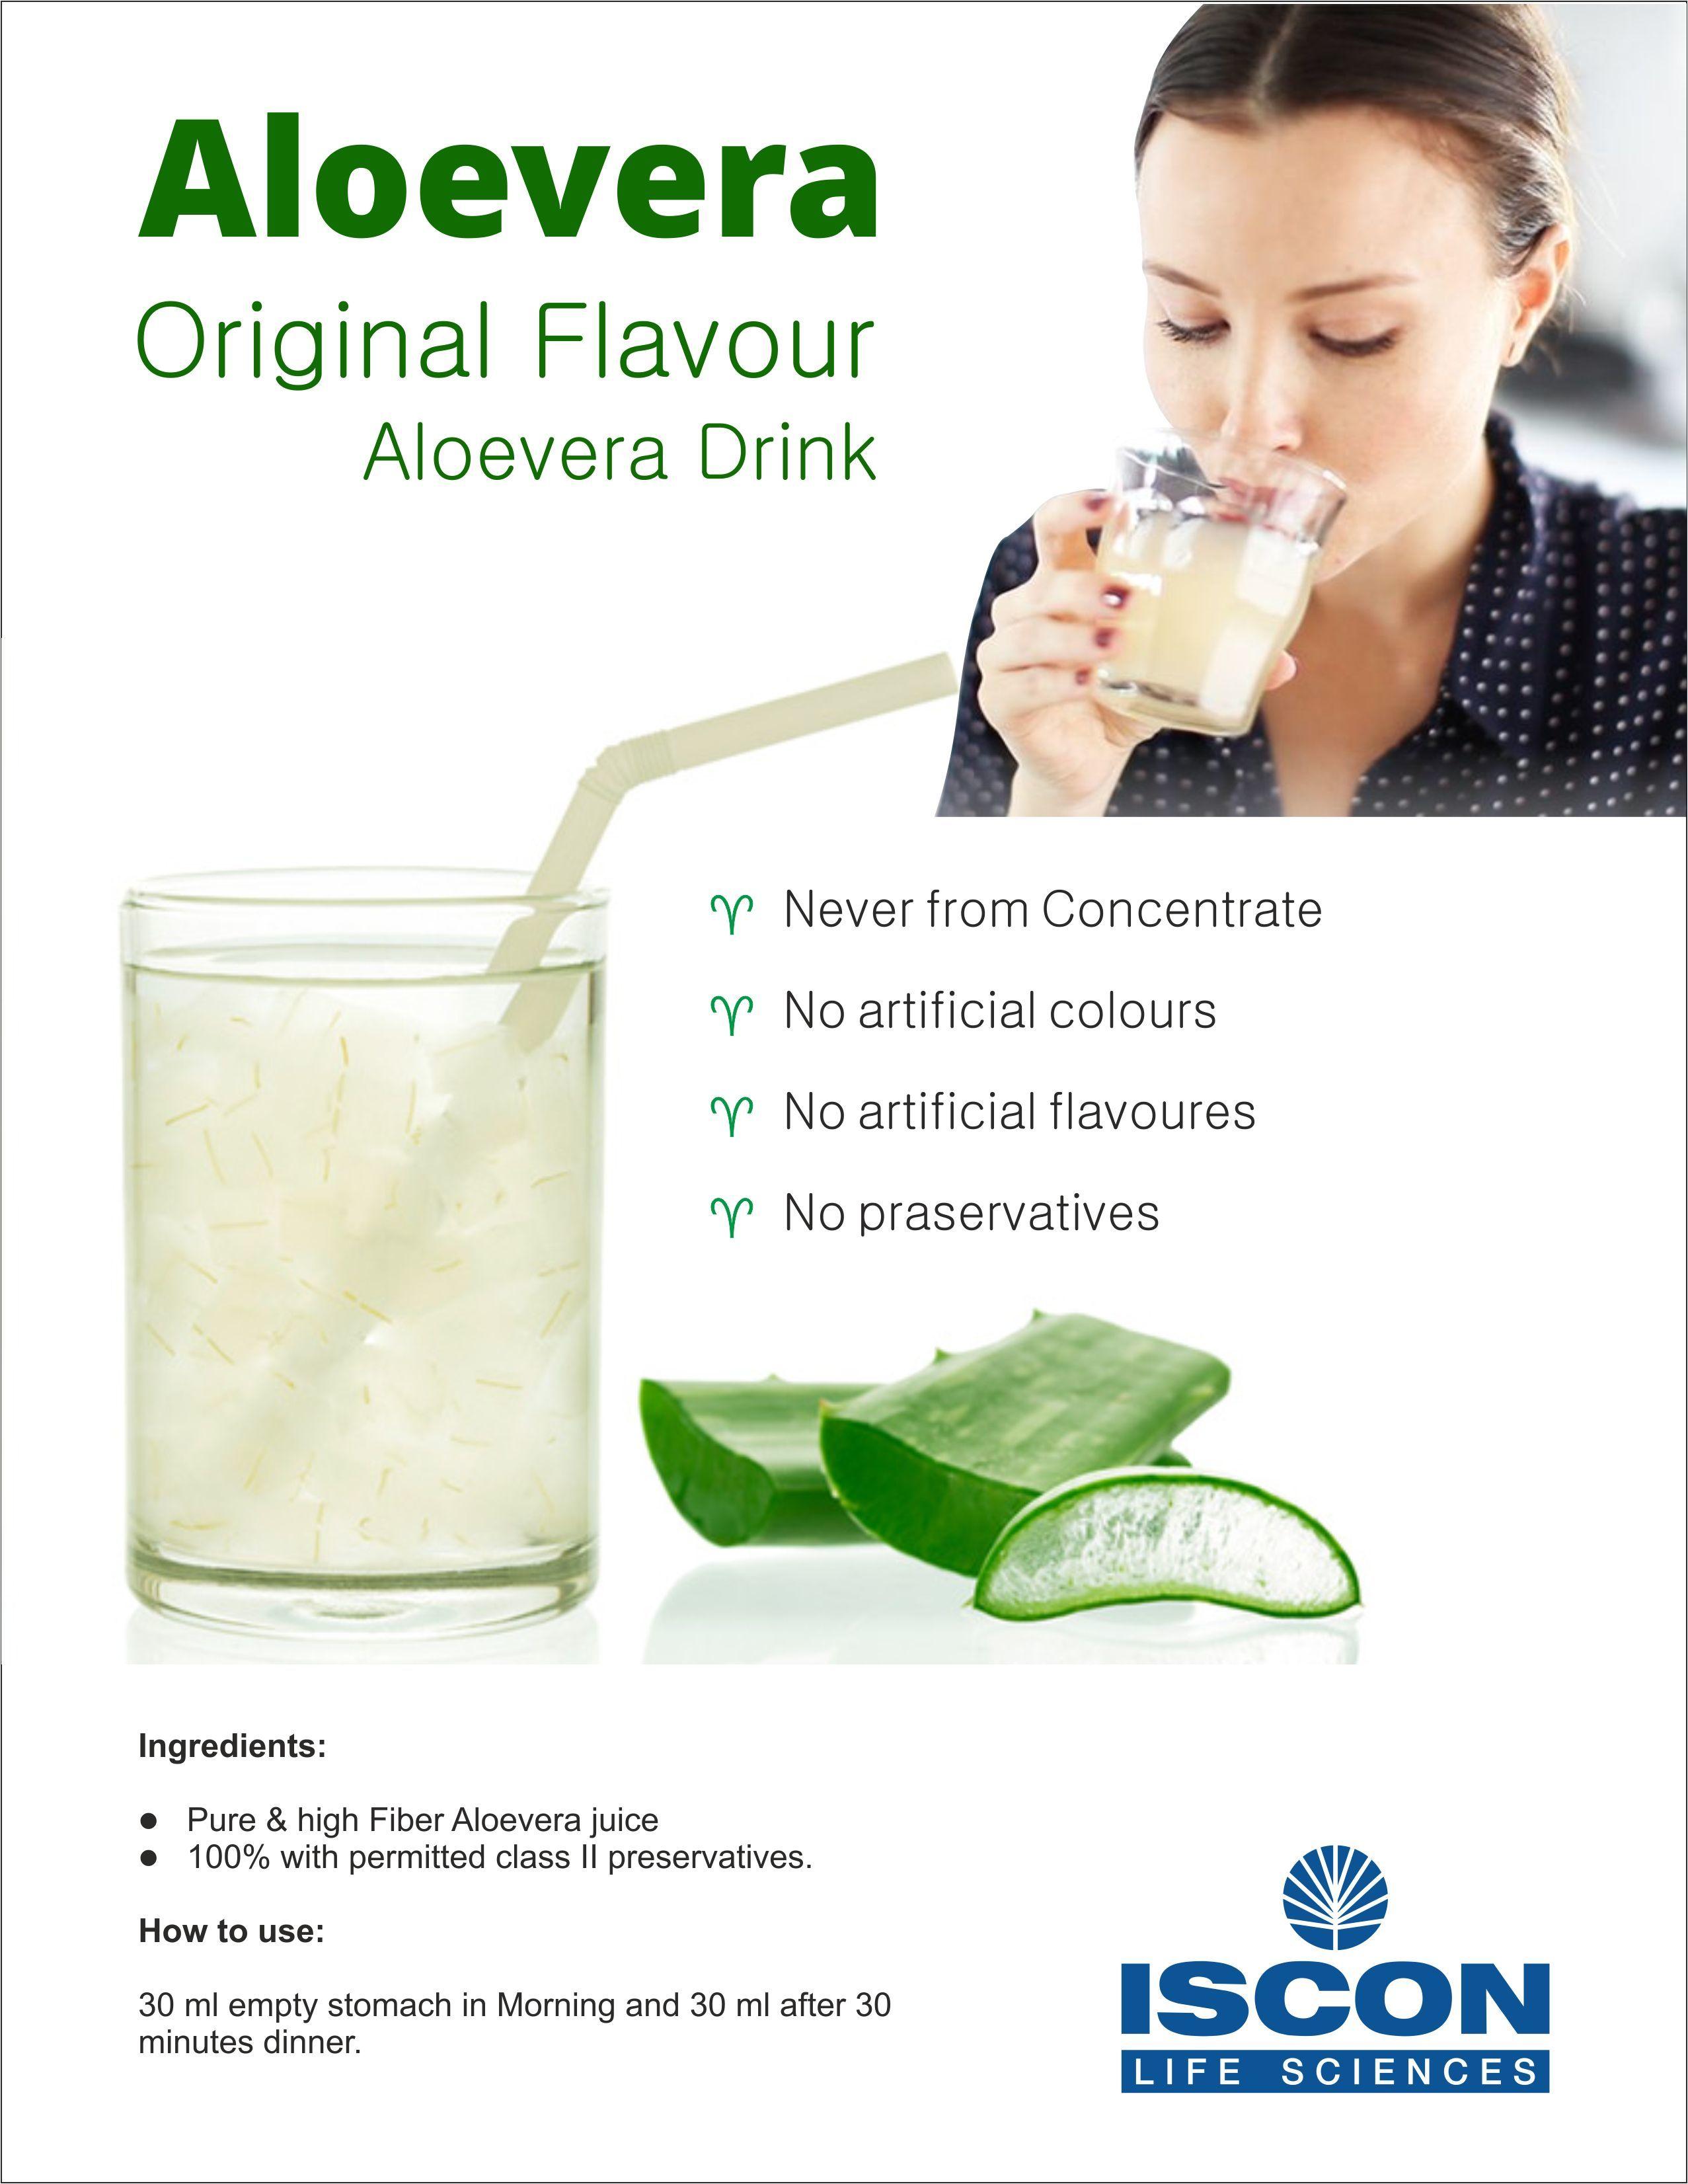 Aloe vera (Original Flavour  Aloe vera Drink)